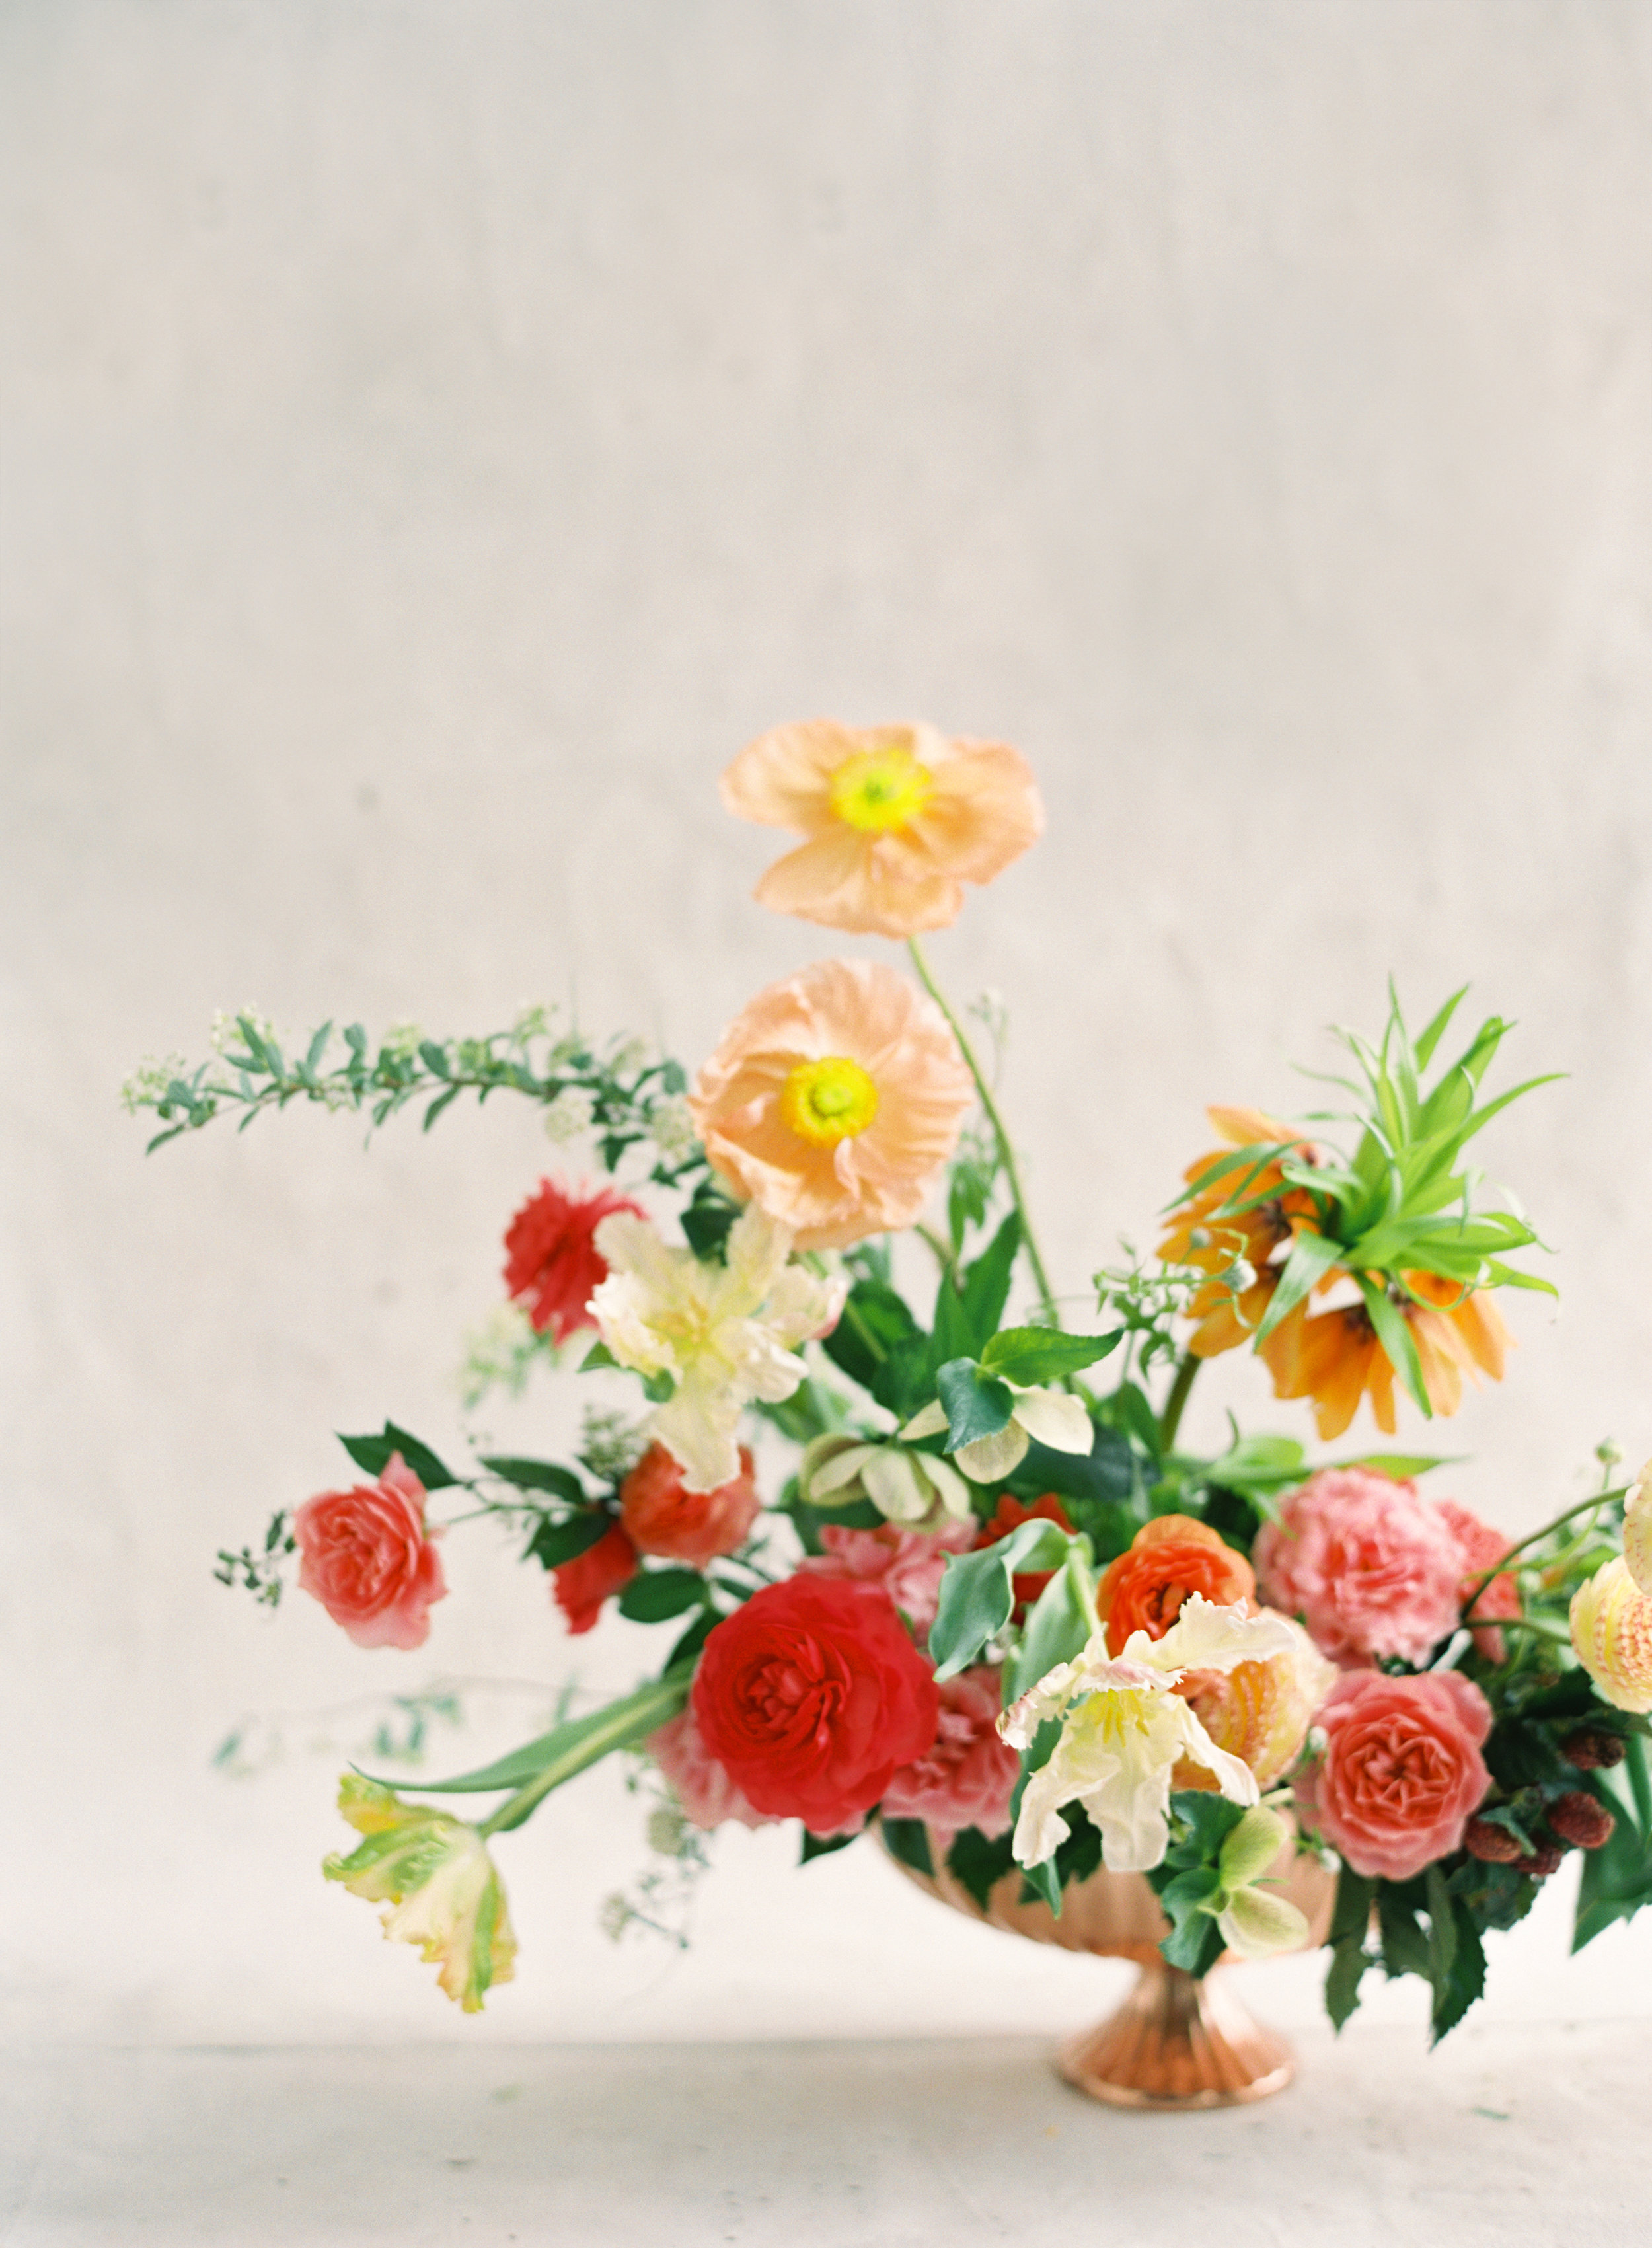 the-floral-society-spring-2018-44-Jen_Huang-002123-R1-009.jpg